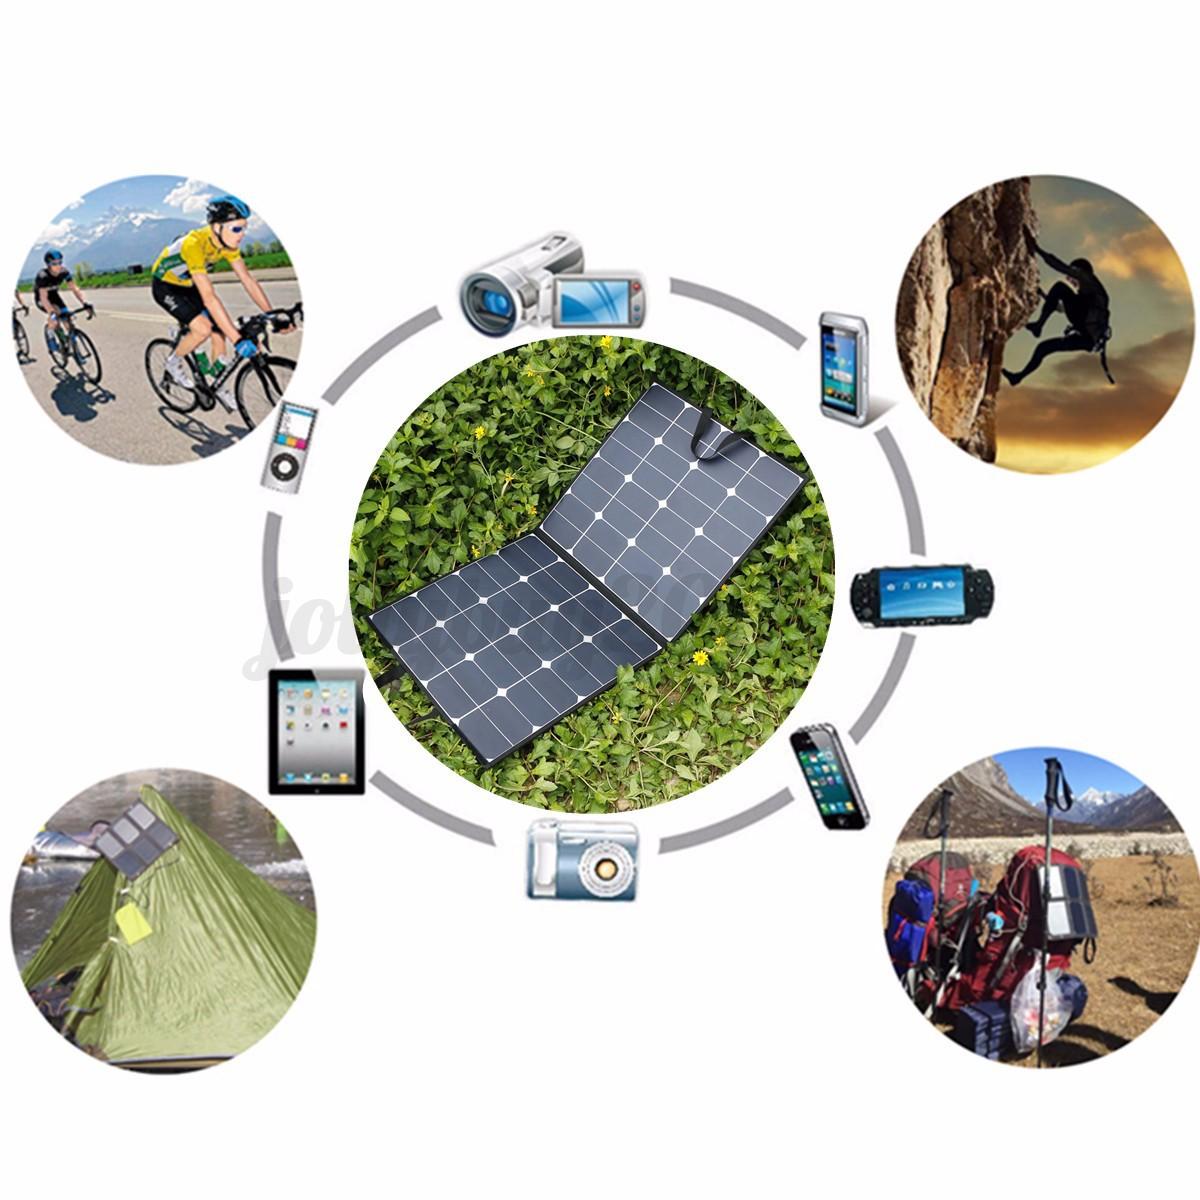 100w 18v faltbar flexible solarpanel solarmodul f r wohnmobil rv boot haus dhl ebay. Black Bedroom Furniture Sets. Home Design Ideas